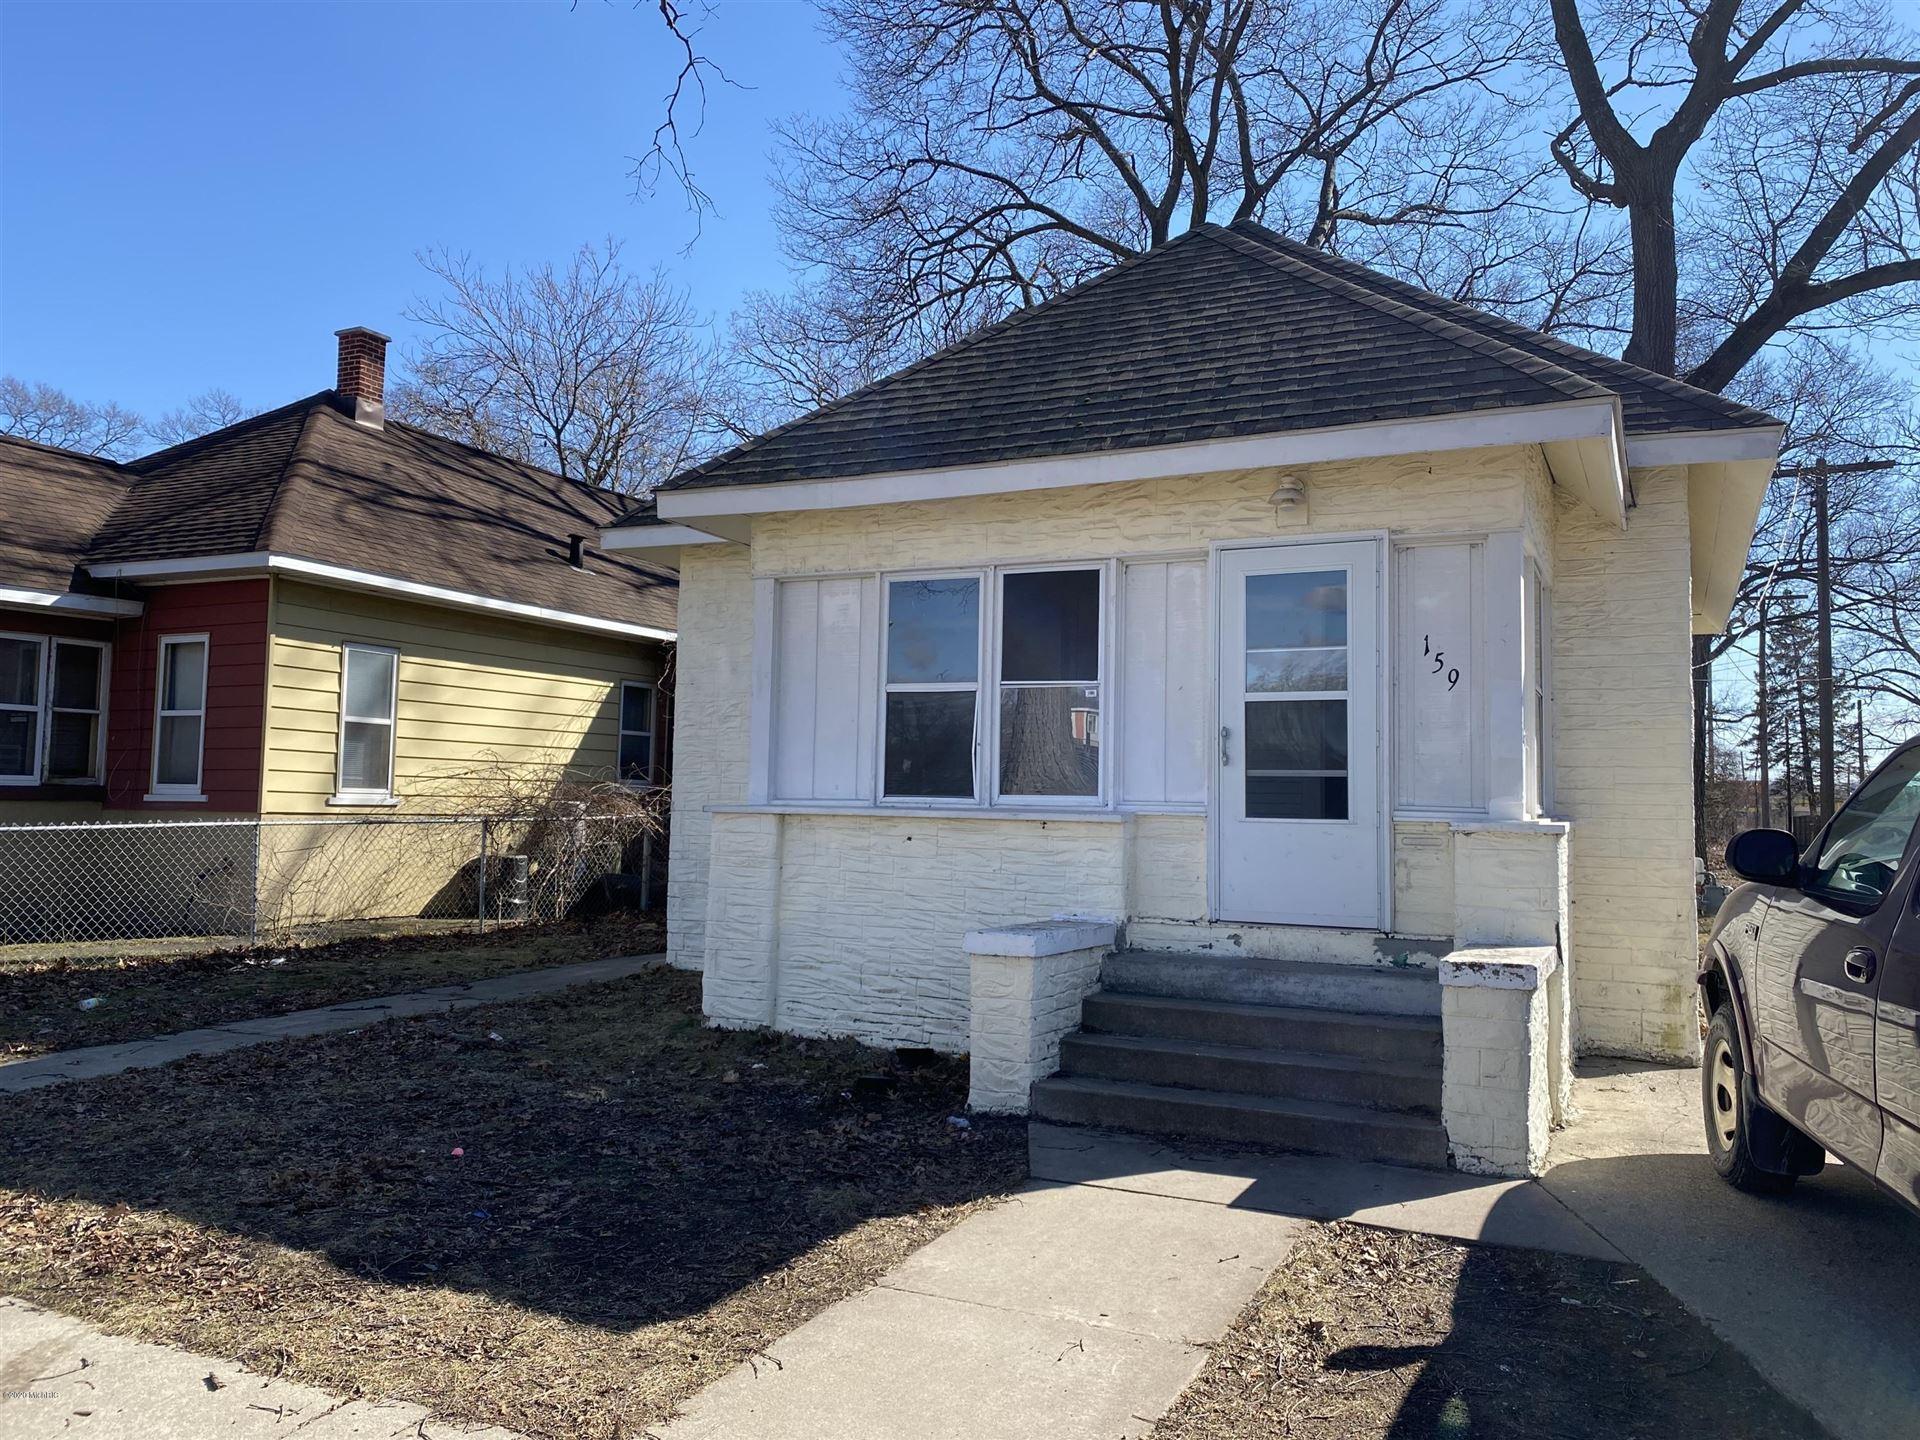 159 W Hume Avenue, Muskegon Heights, MI 49444 - MLS#: 20010267